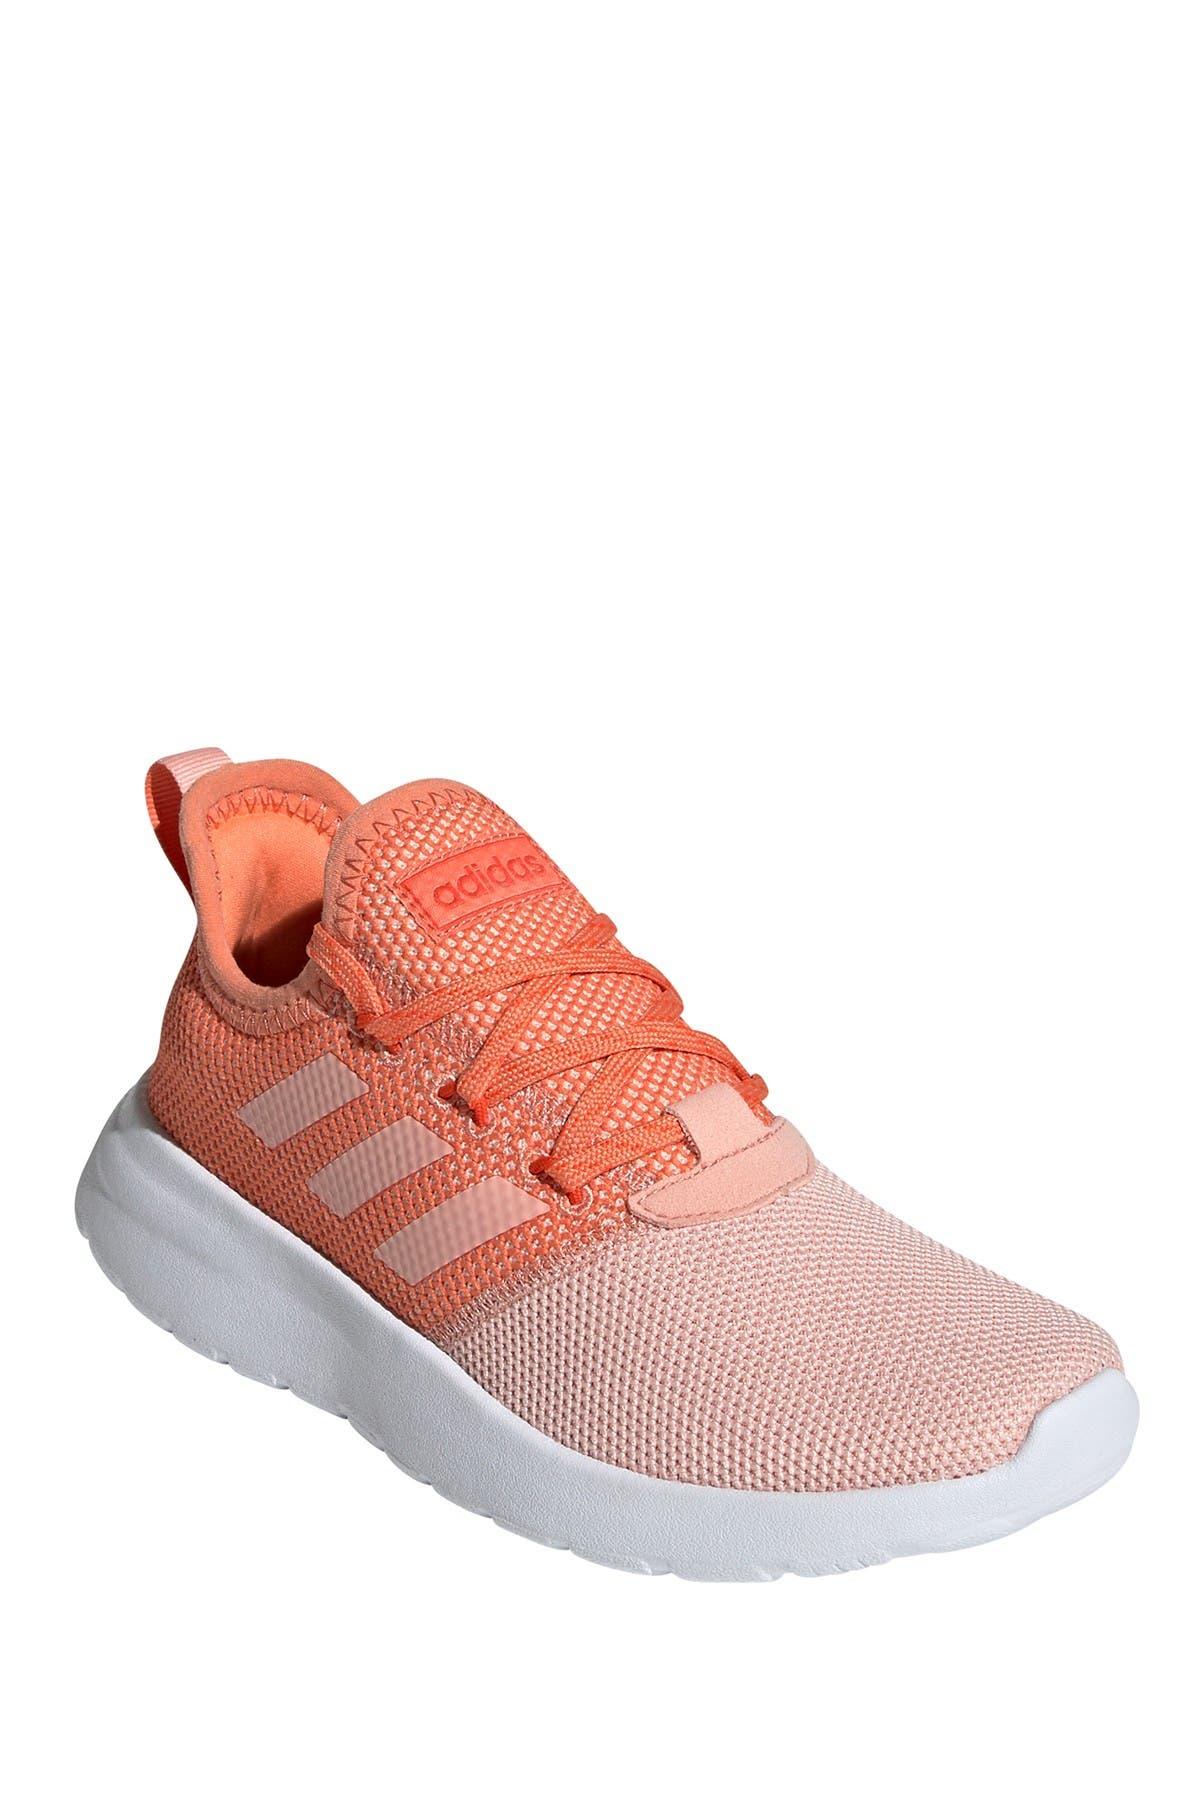 adidas | Lite Racer RBN Sneaker